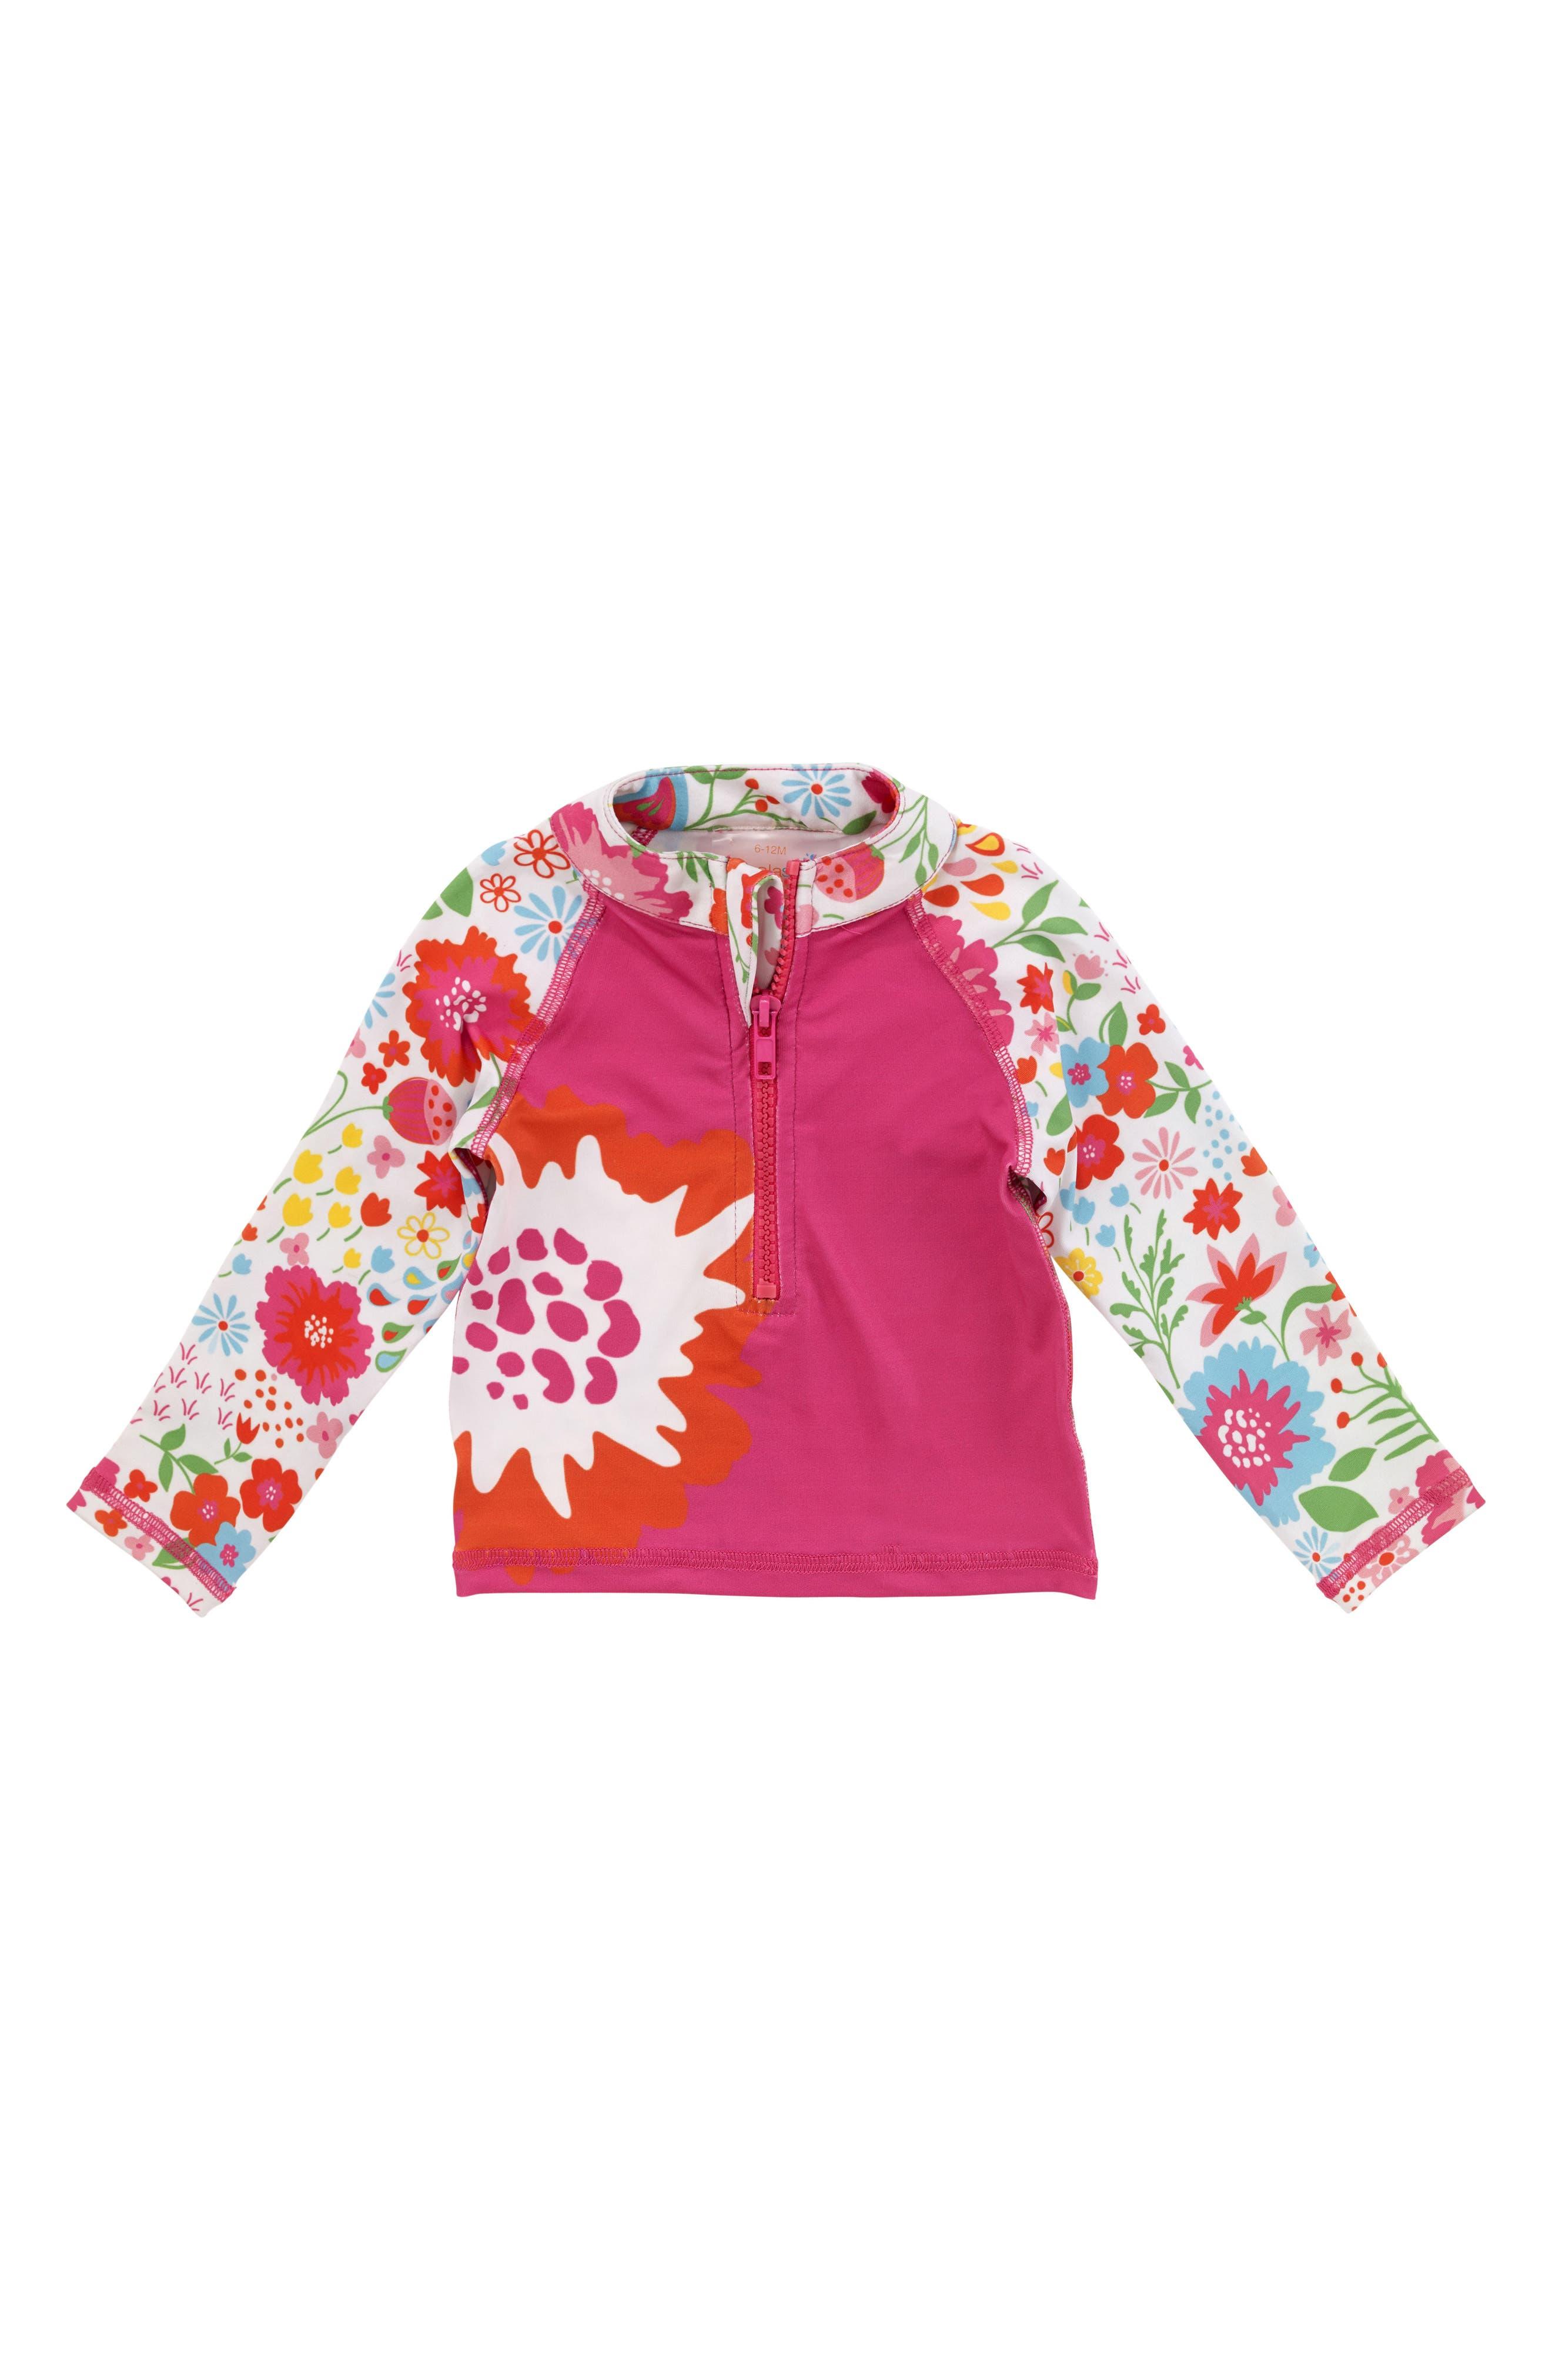 Long Sleeve Rashguard,                         Main,                         color, Pink Multi